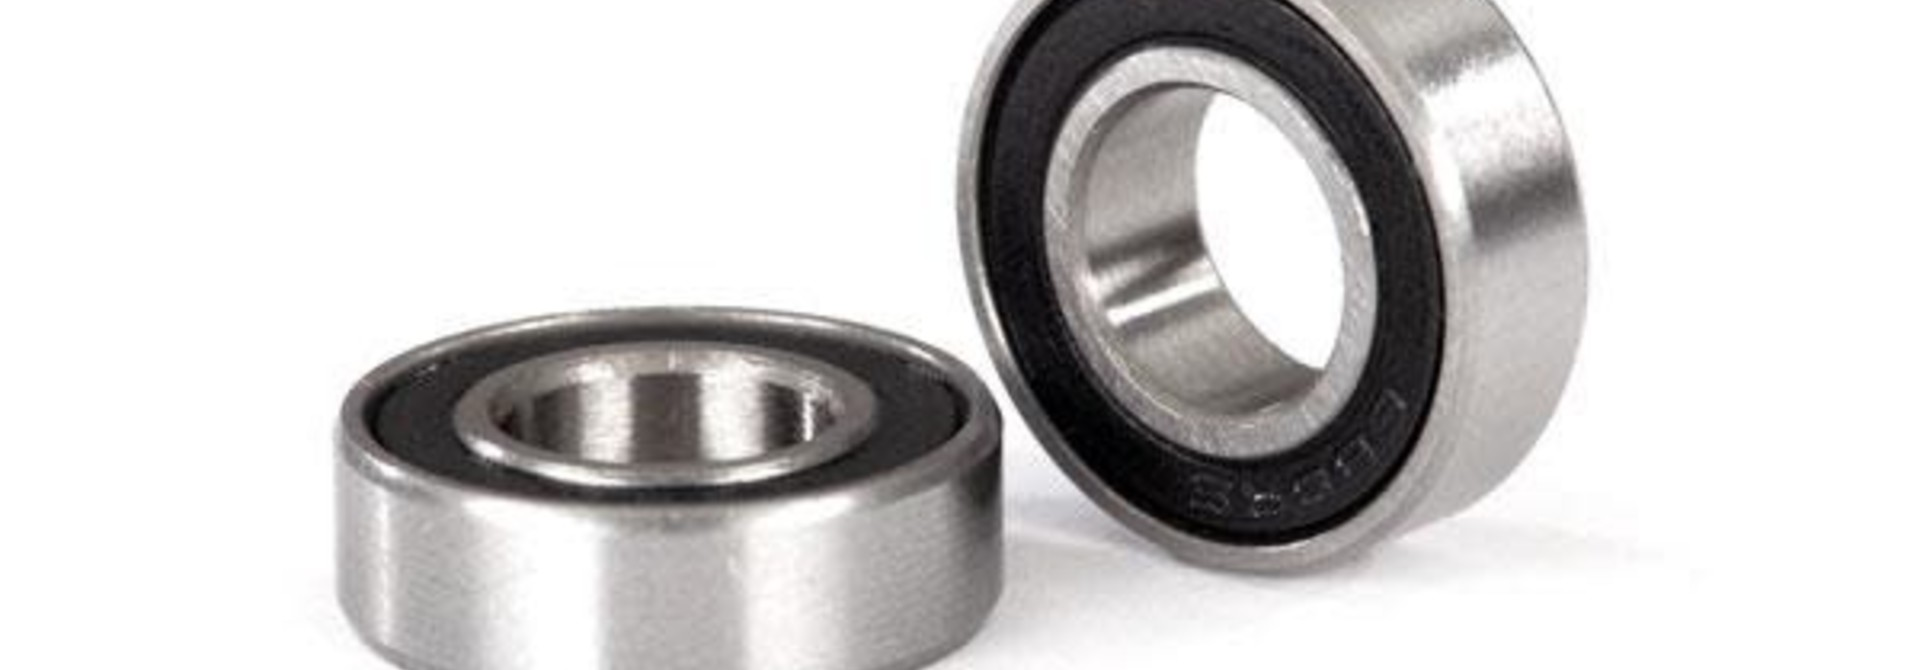 Ball bearings, black rubber sealed (8x16x5mm) (2)